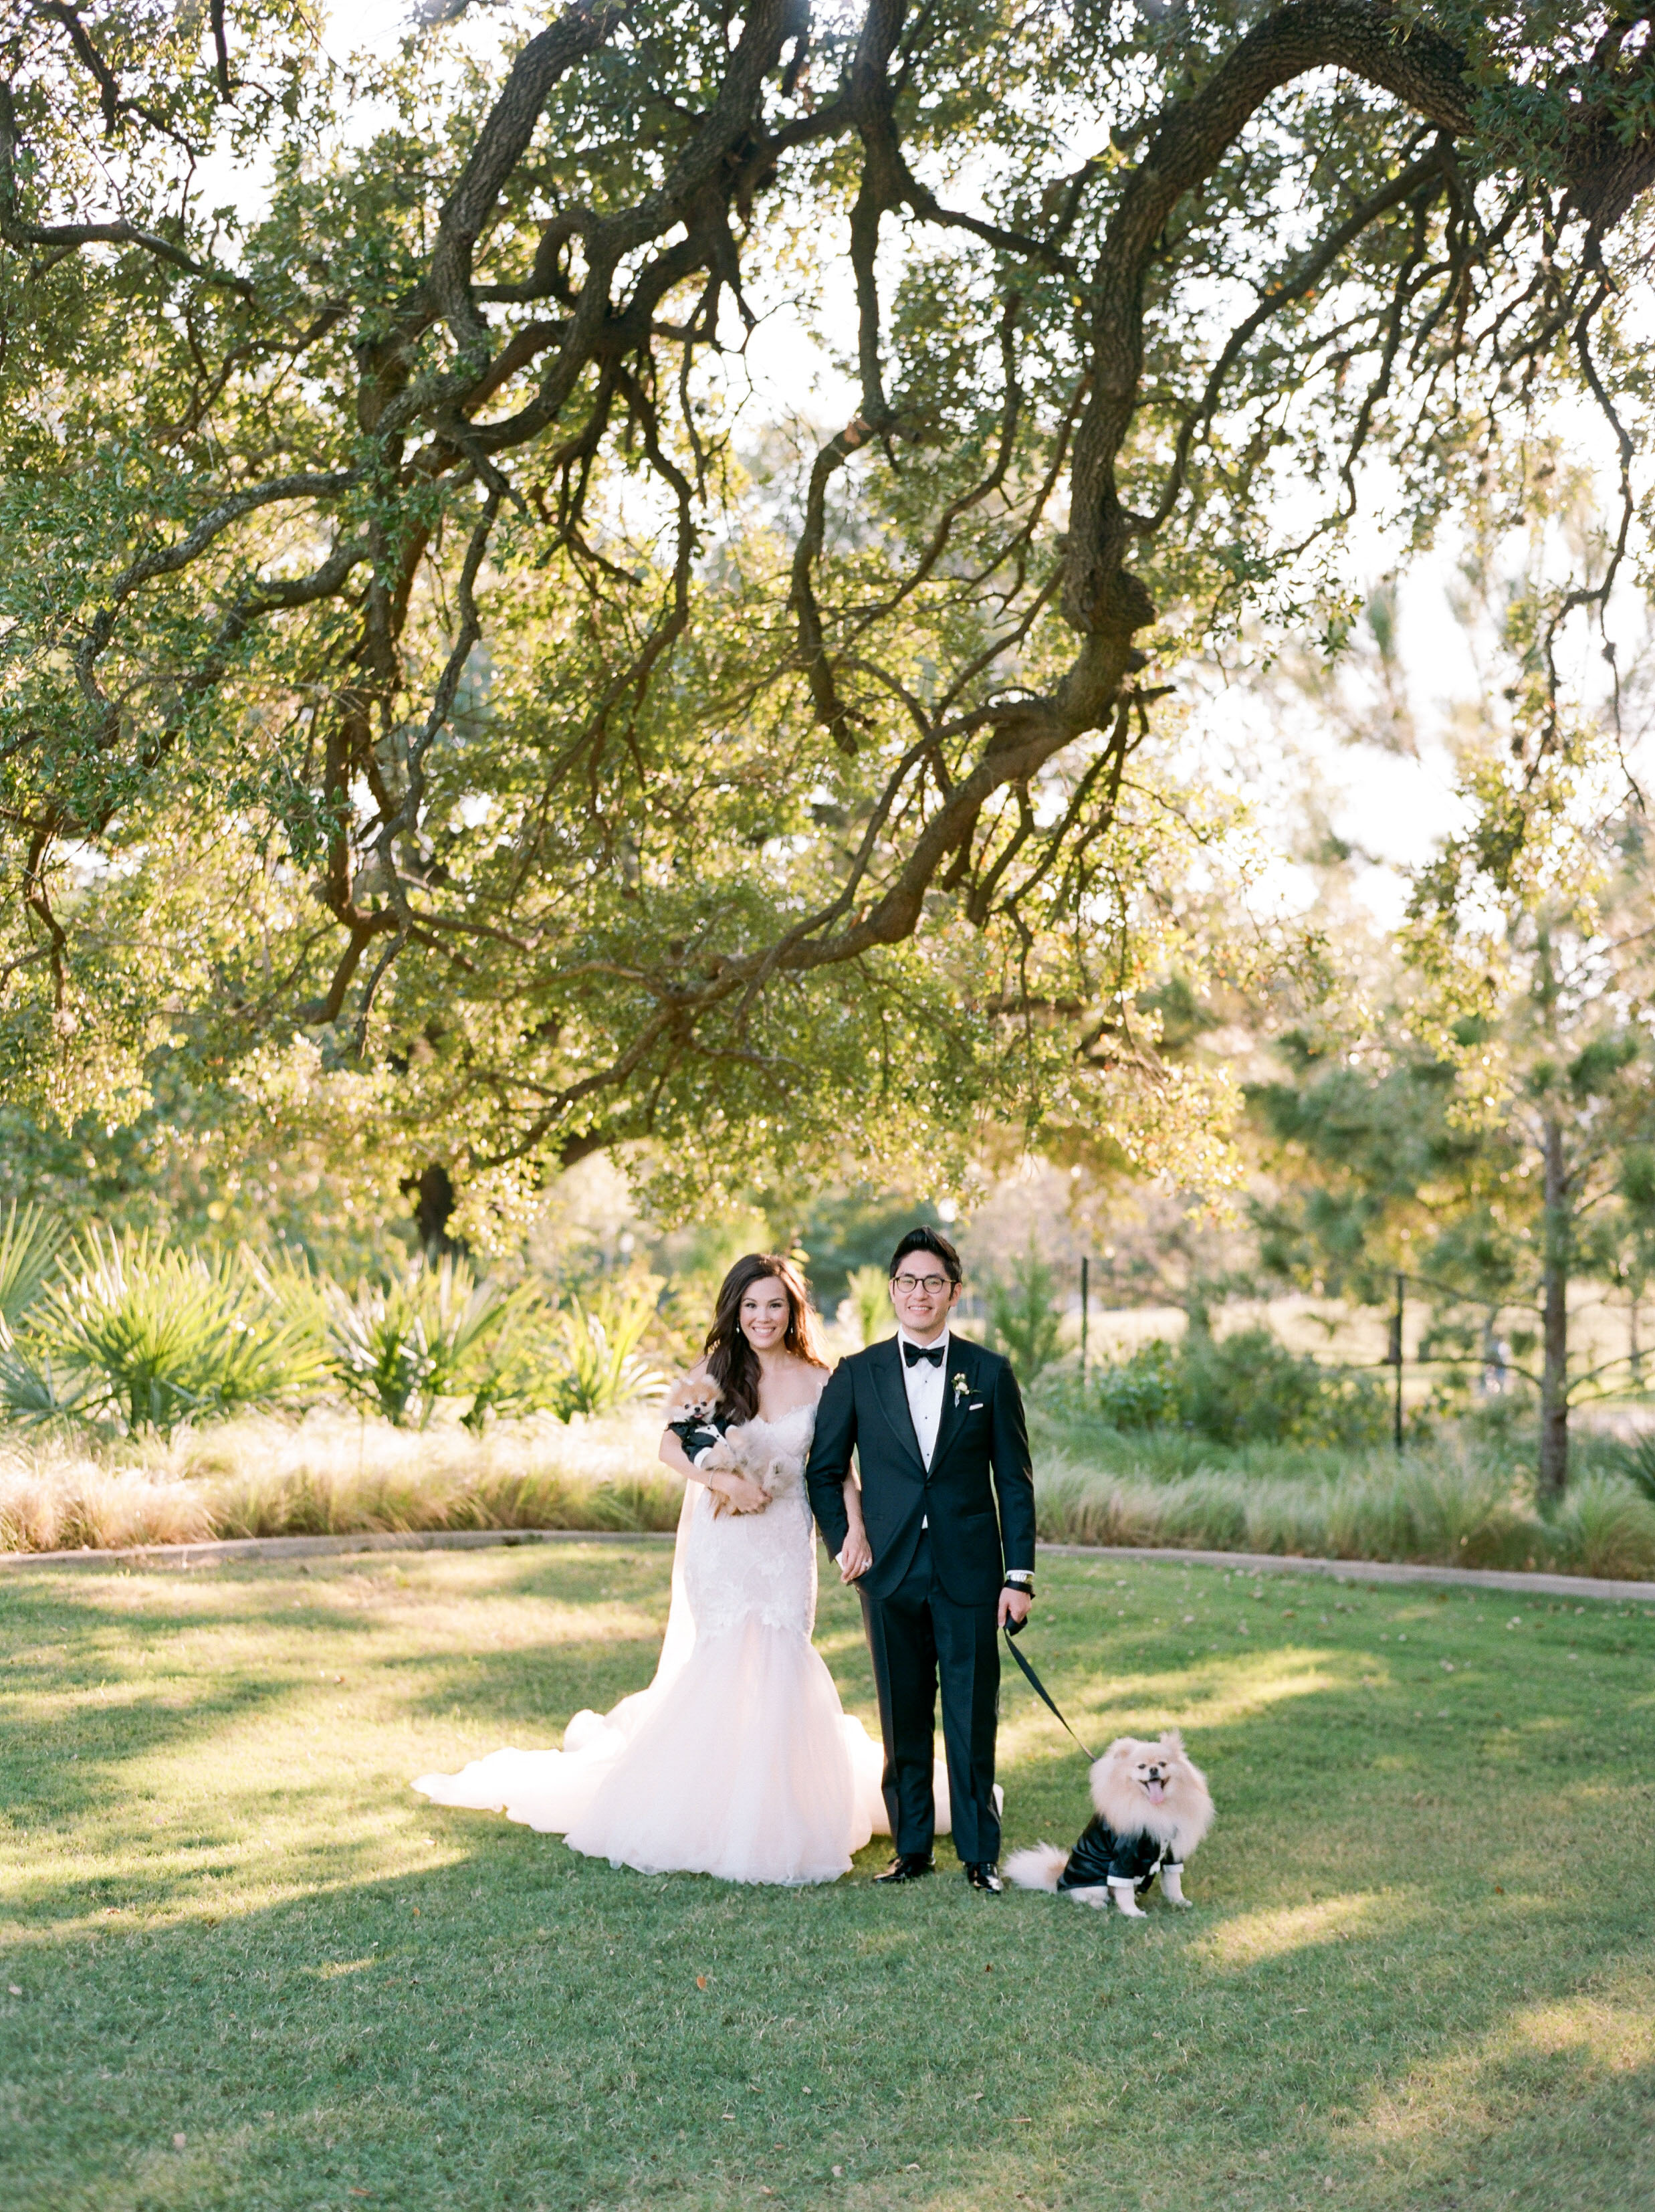 Martha-Stewart-Wedding-Dana-Fernandez-Photography-Josh-Texas-Film-Houston-Wedding-Fine-Art-Photographer-McGovern-Centennial-Gardens-Top-Best-41.jpg